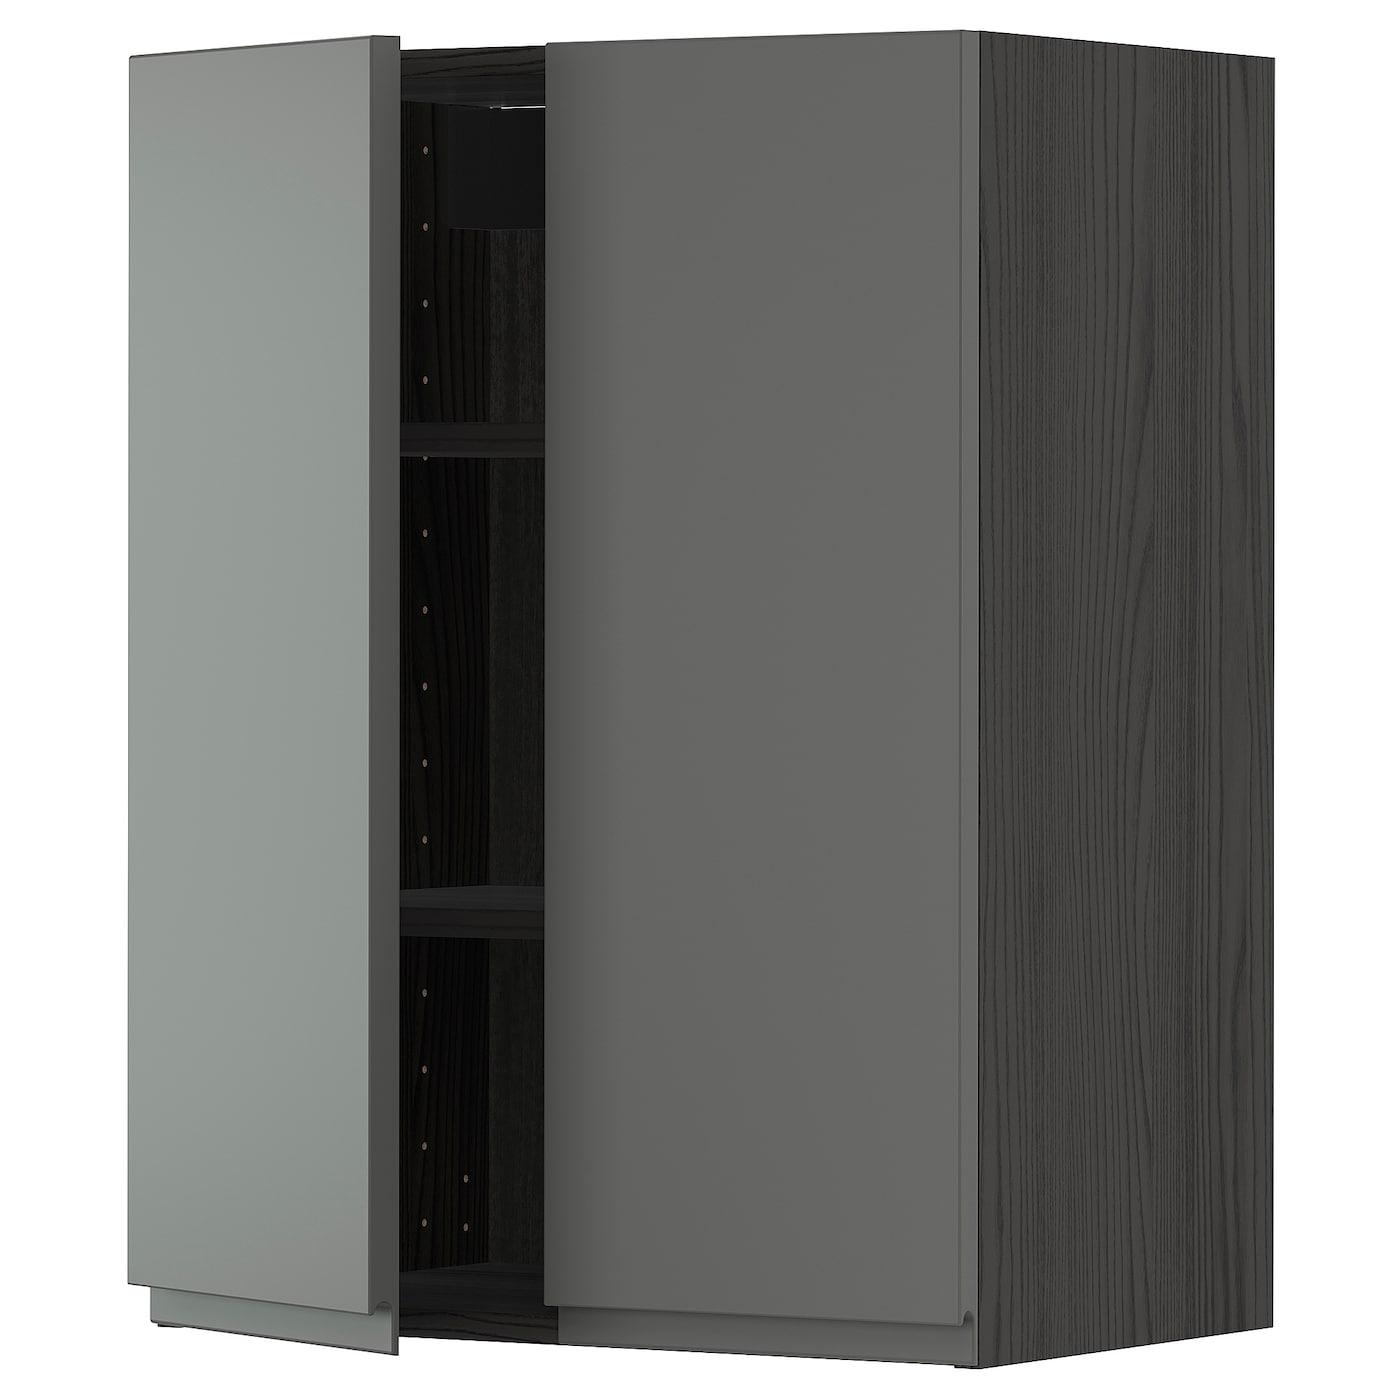 Wall Cabinet With Shelves 2 Doors Metod Black Voxtorp Dark Grey